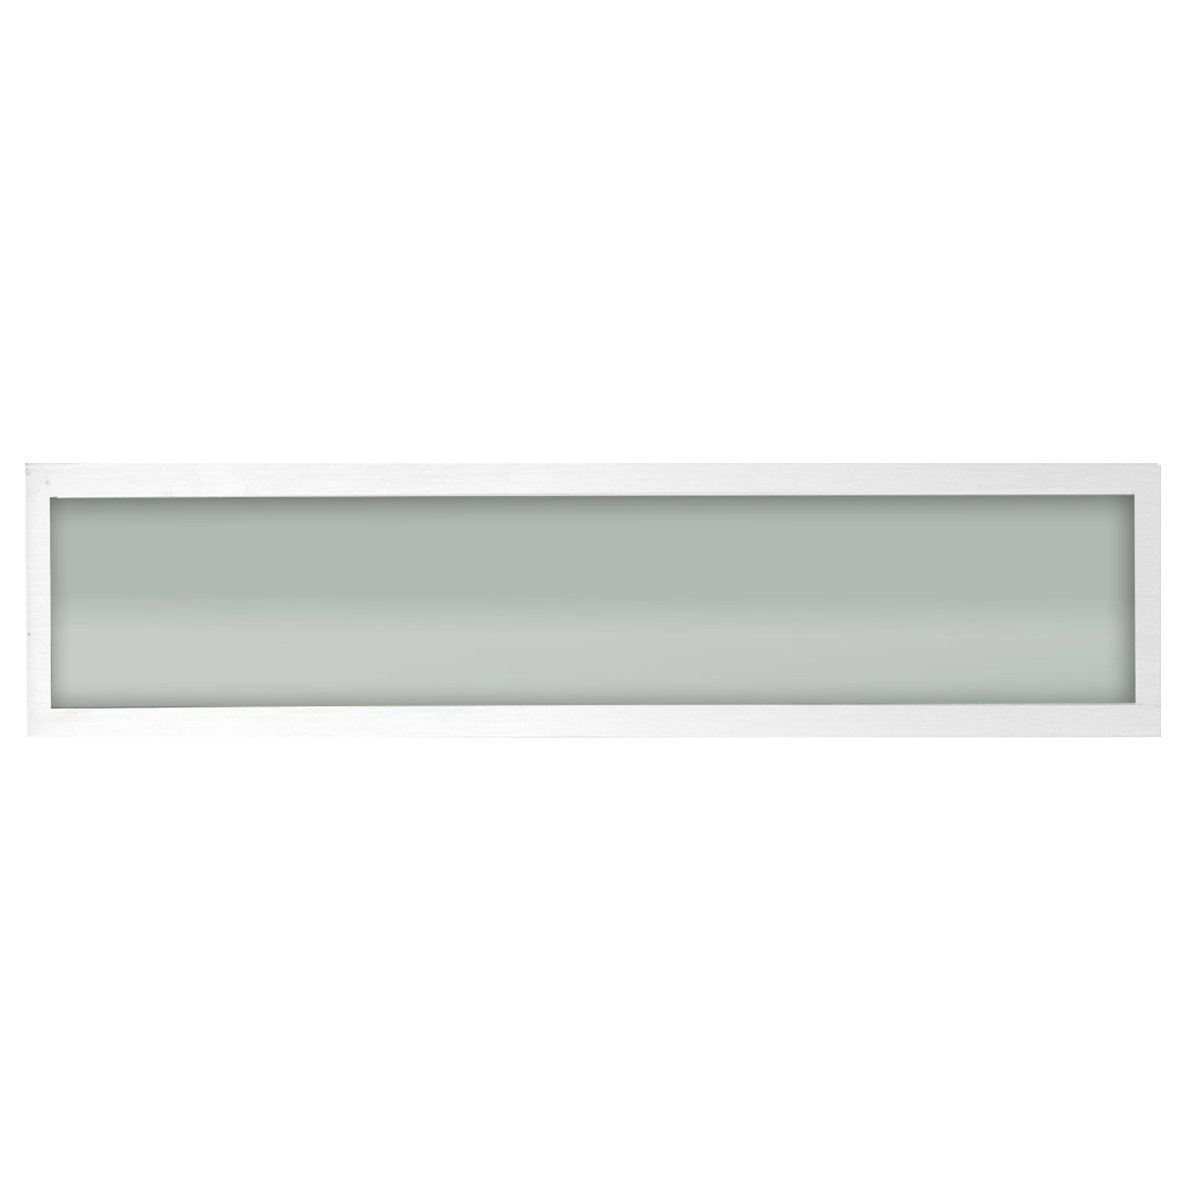 Plafon Space Sobr. Ret. 135cm Alum. Vidro Fosco 2x40w Fluor. Branco